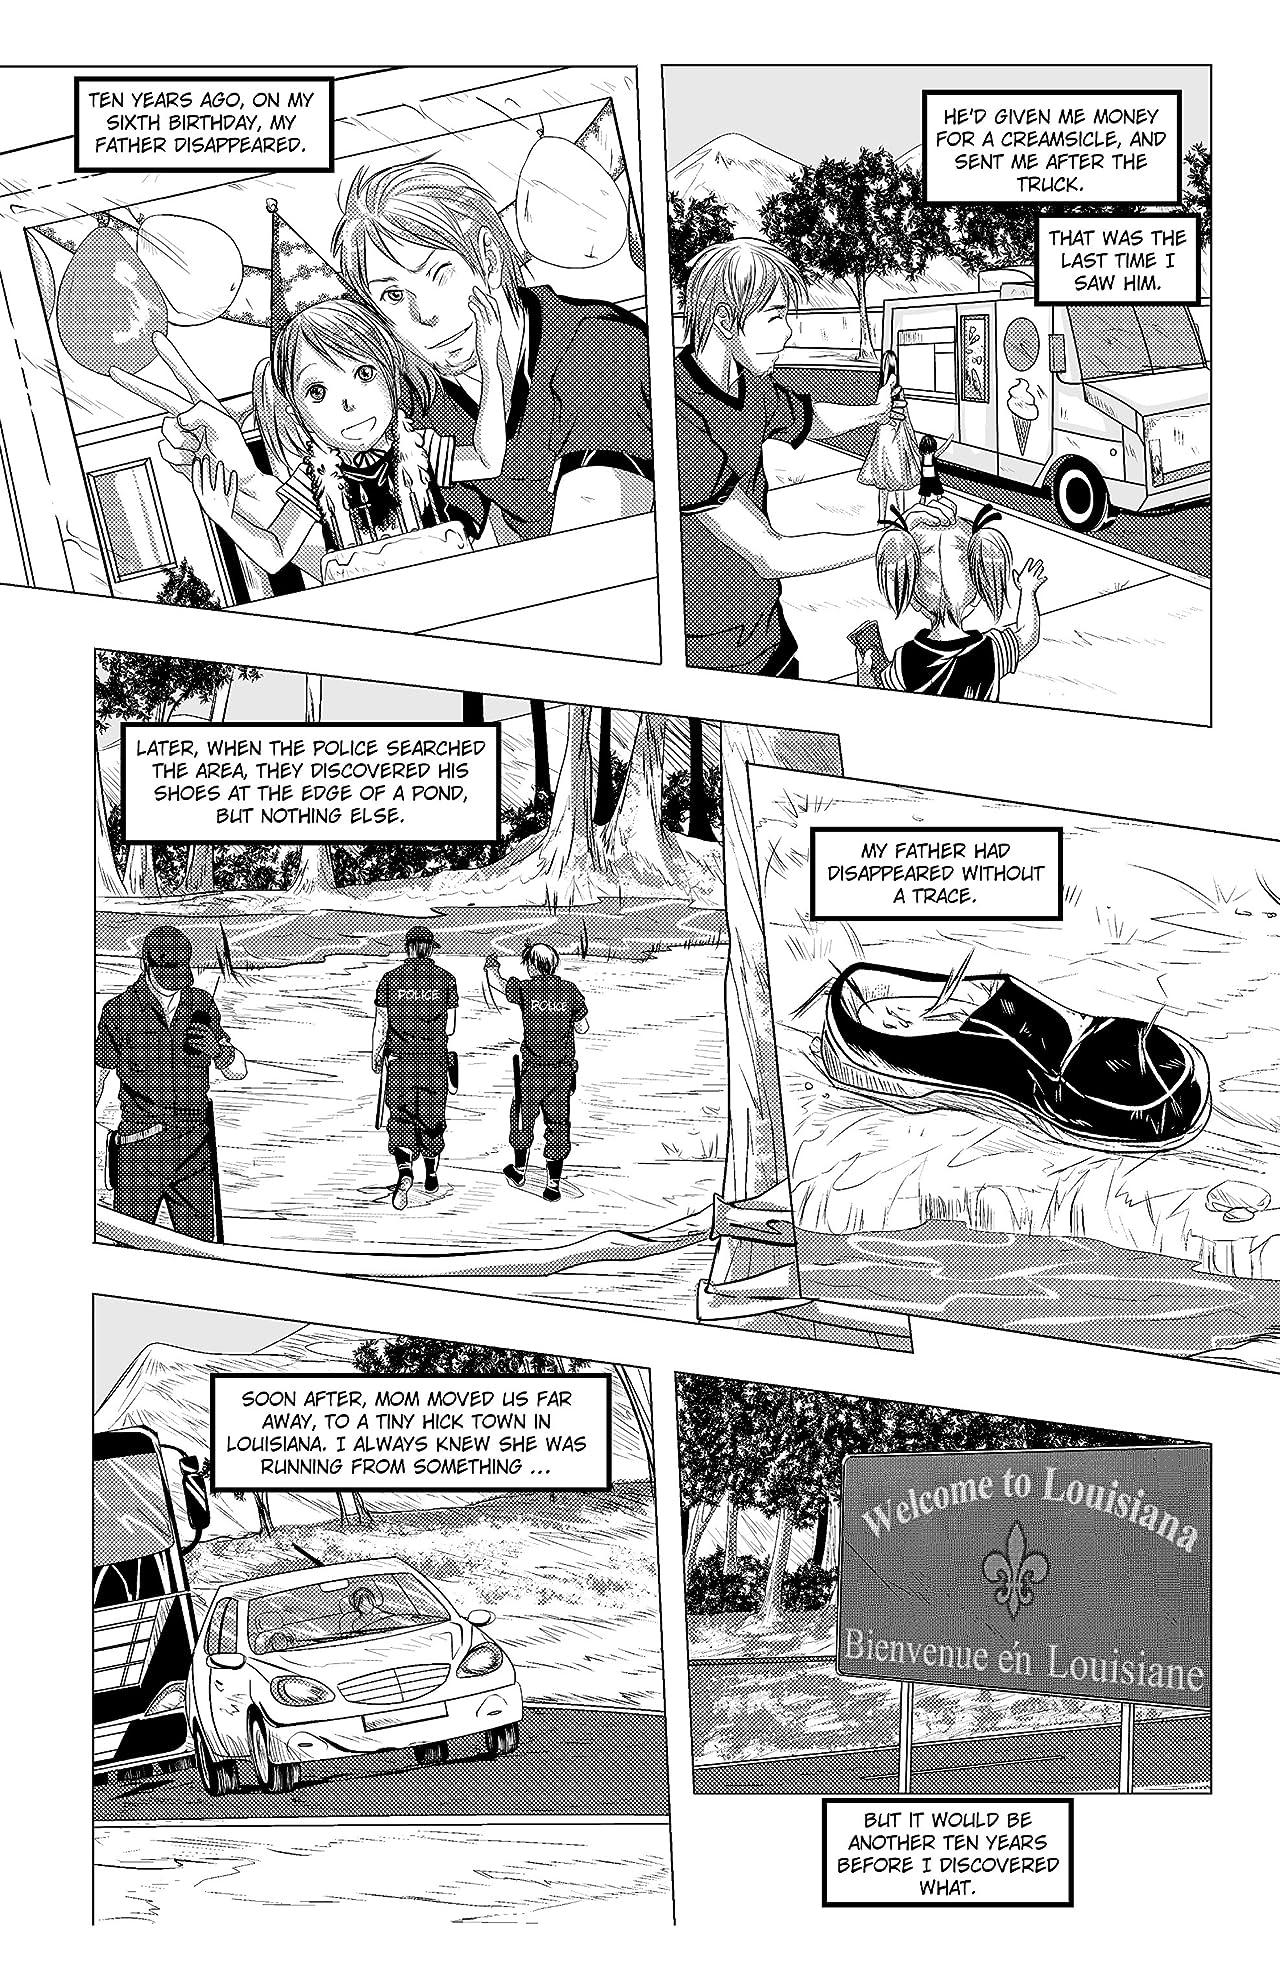 Julie Kagawa's The Iron King #1